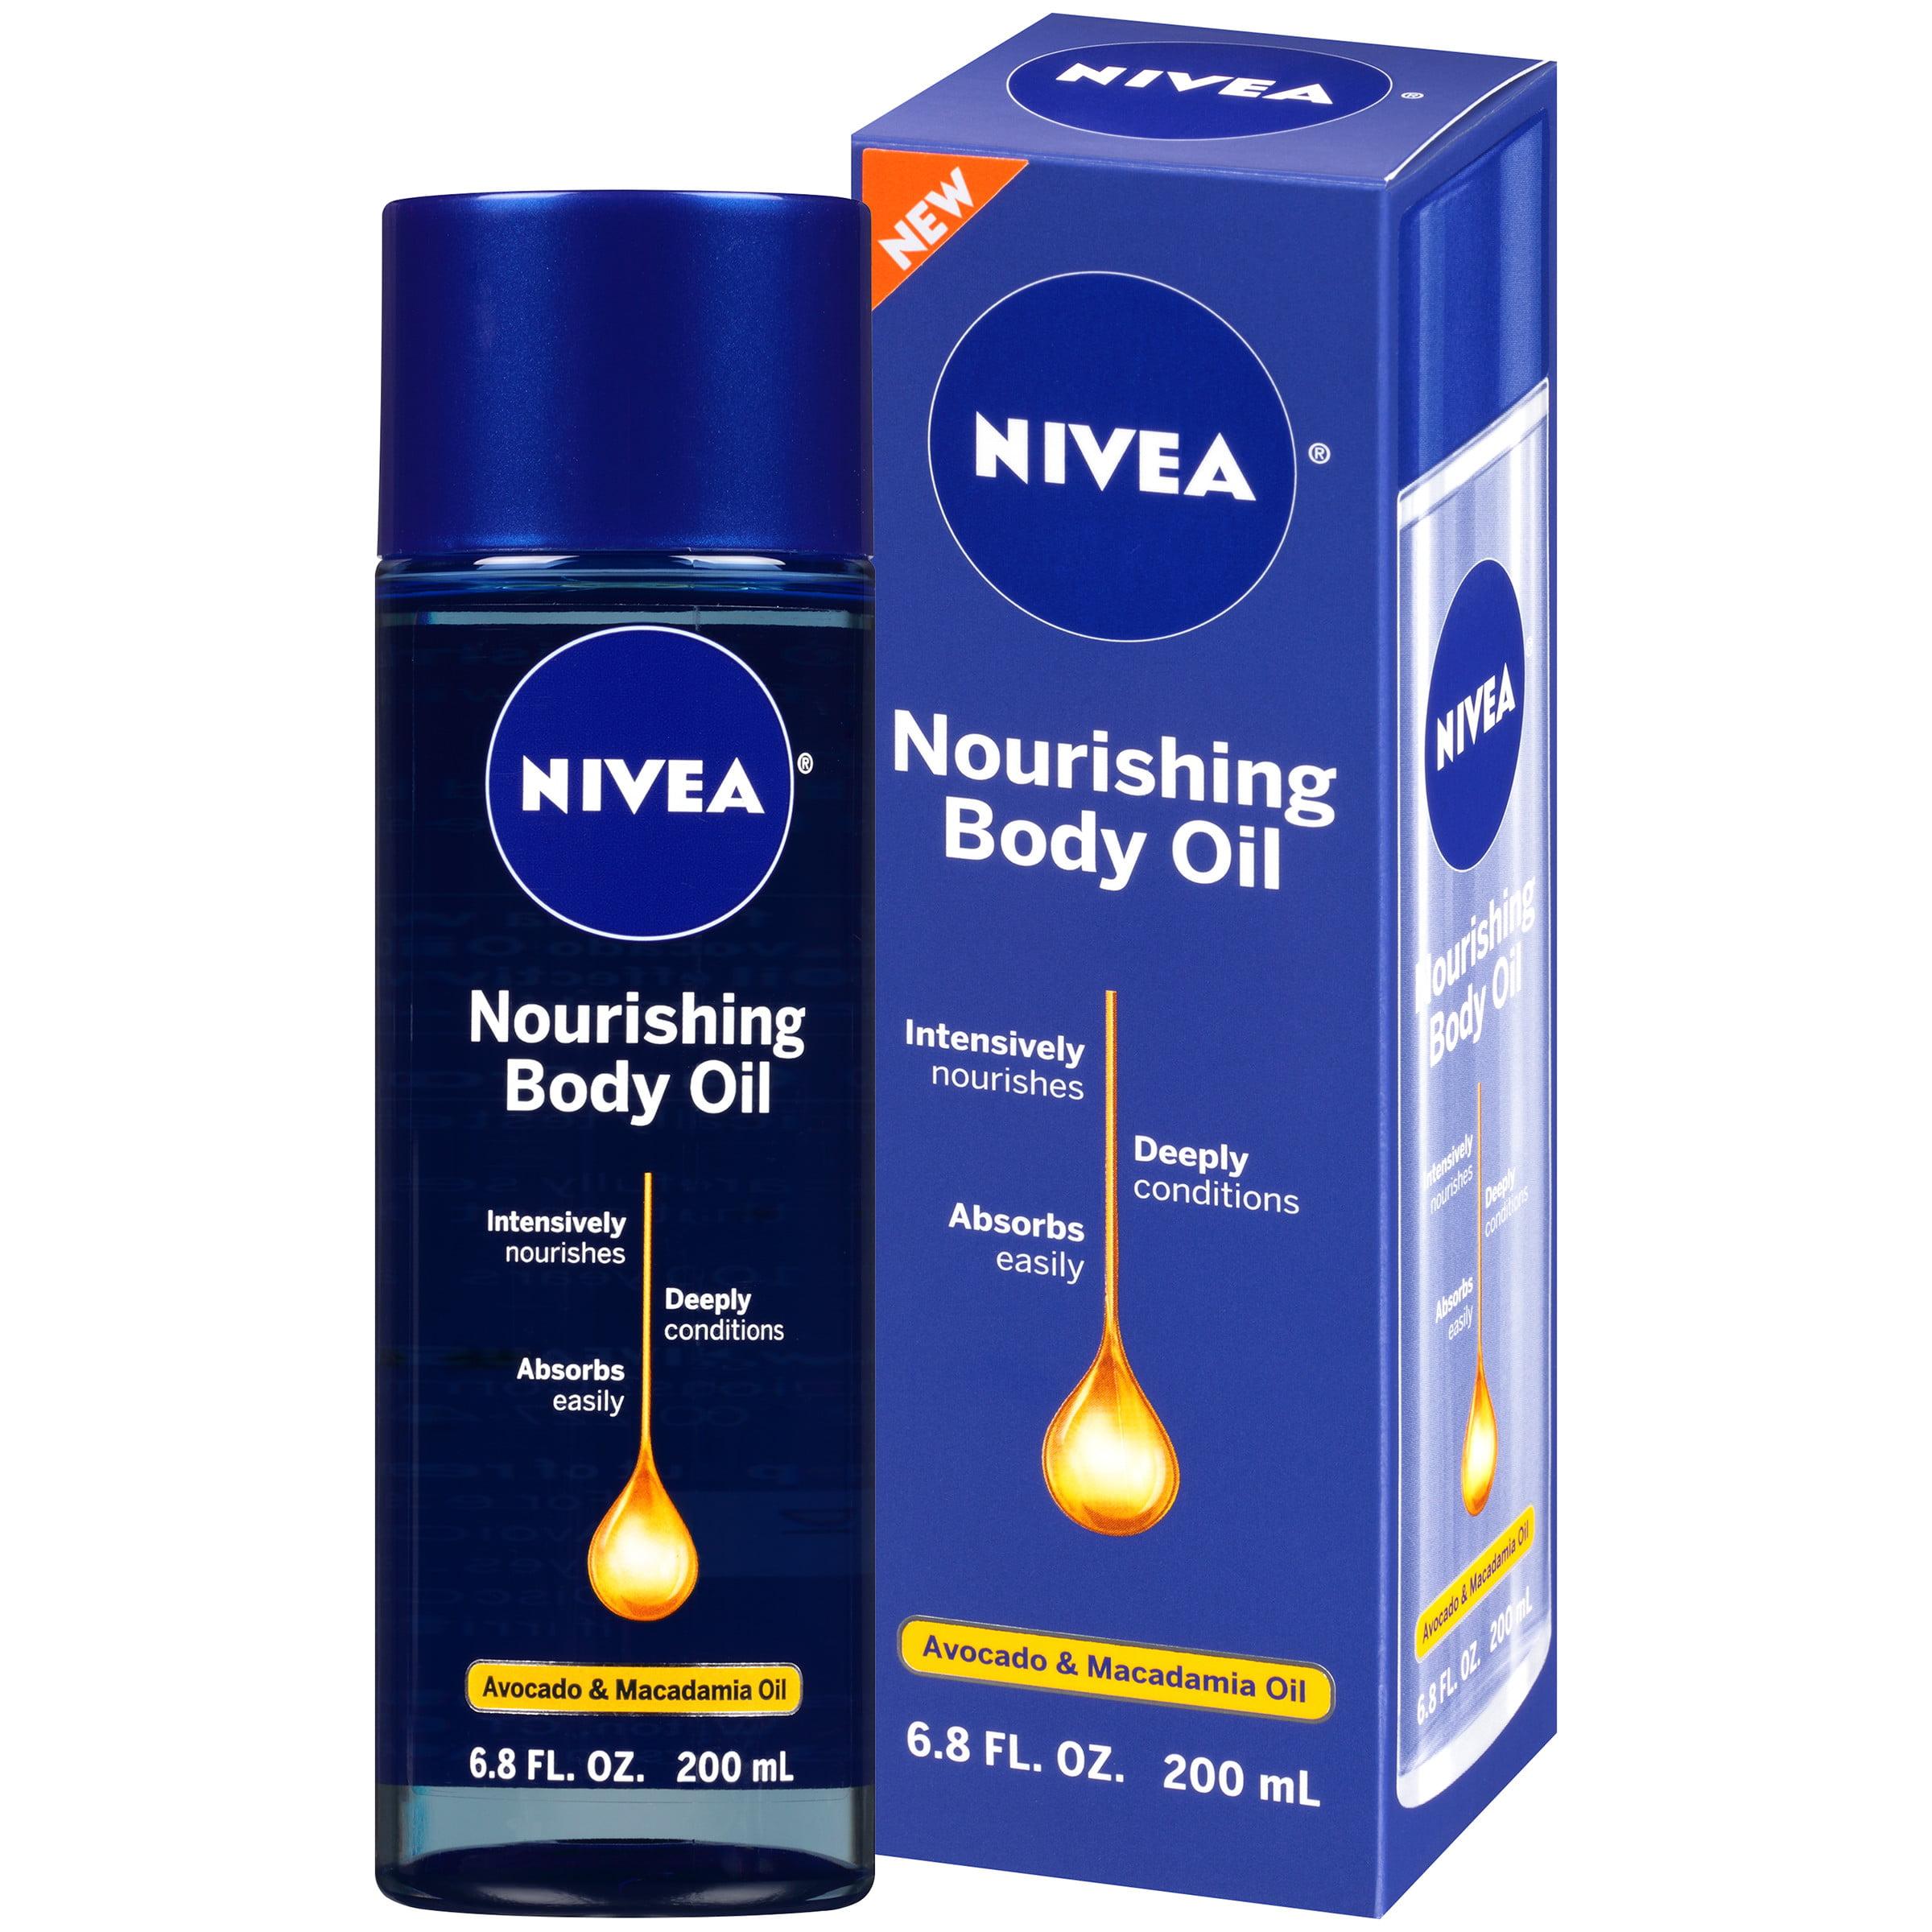 NIVEA Nourishing Body Oil 6.8 fl. oz. - Walmart.com